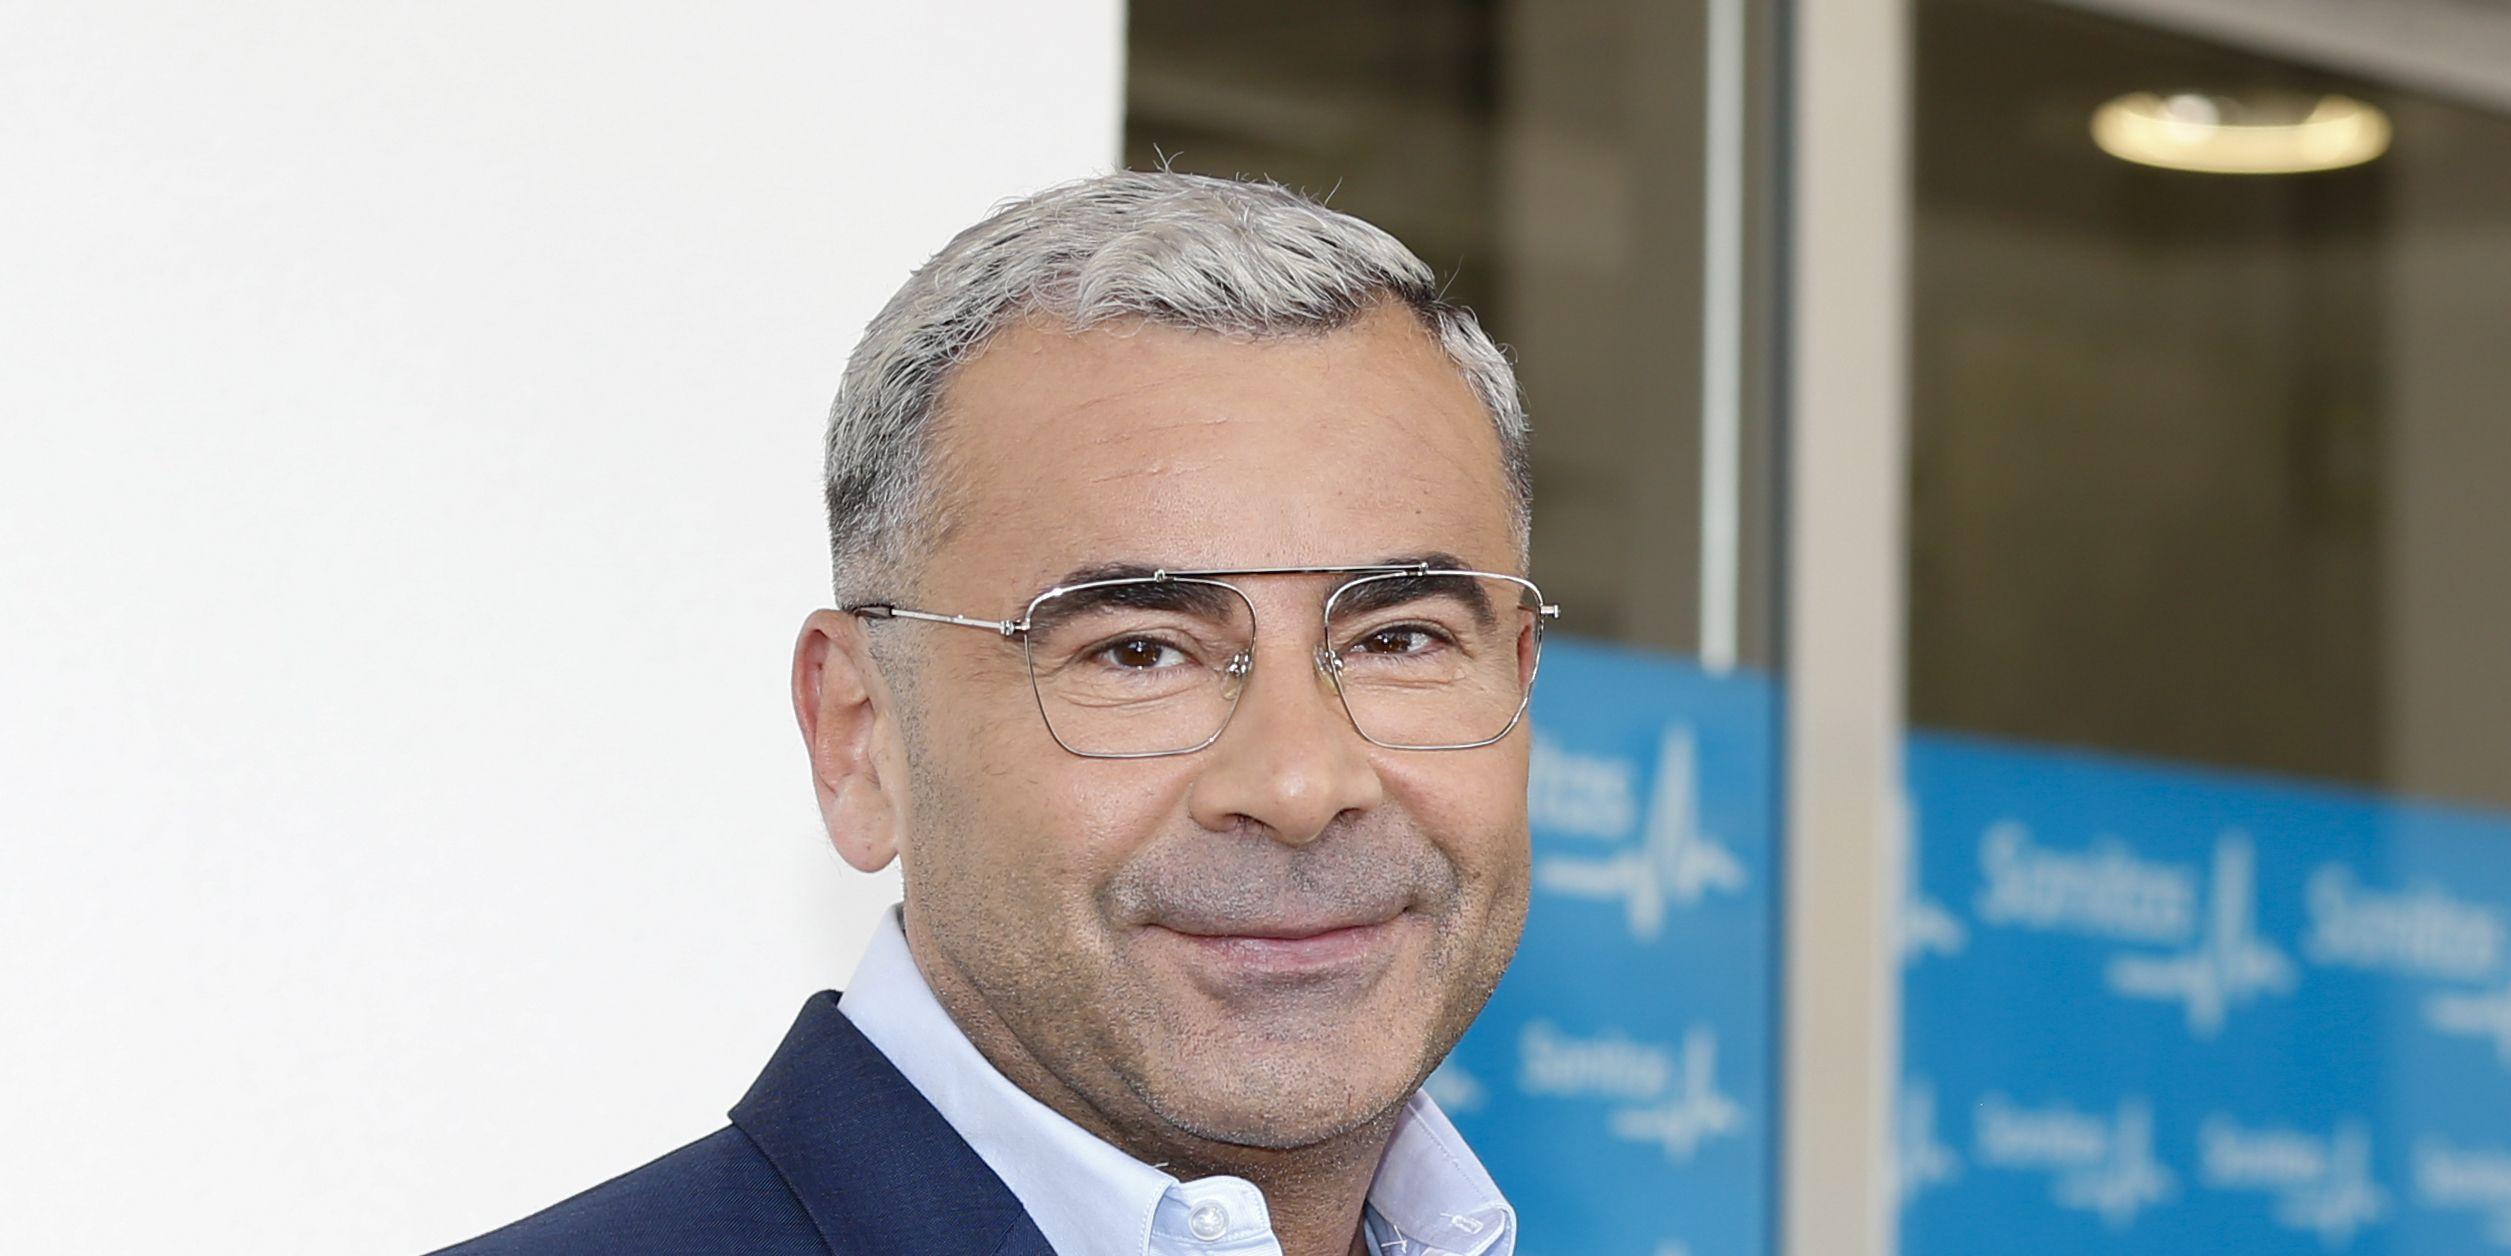 Jorge Javier Vázquez vuelve a la televisión a presentar supervivientes